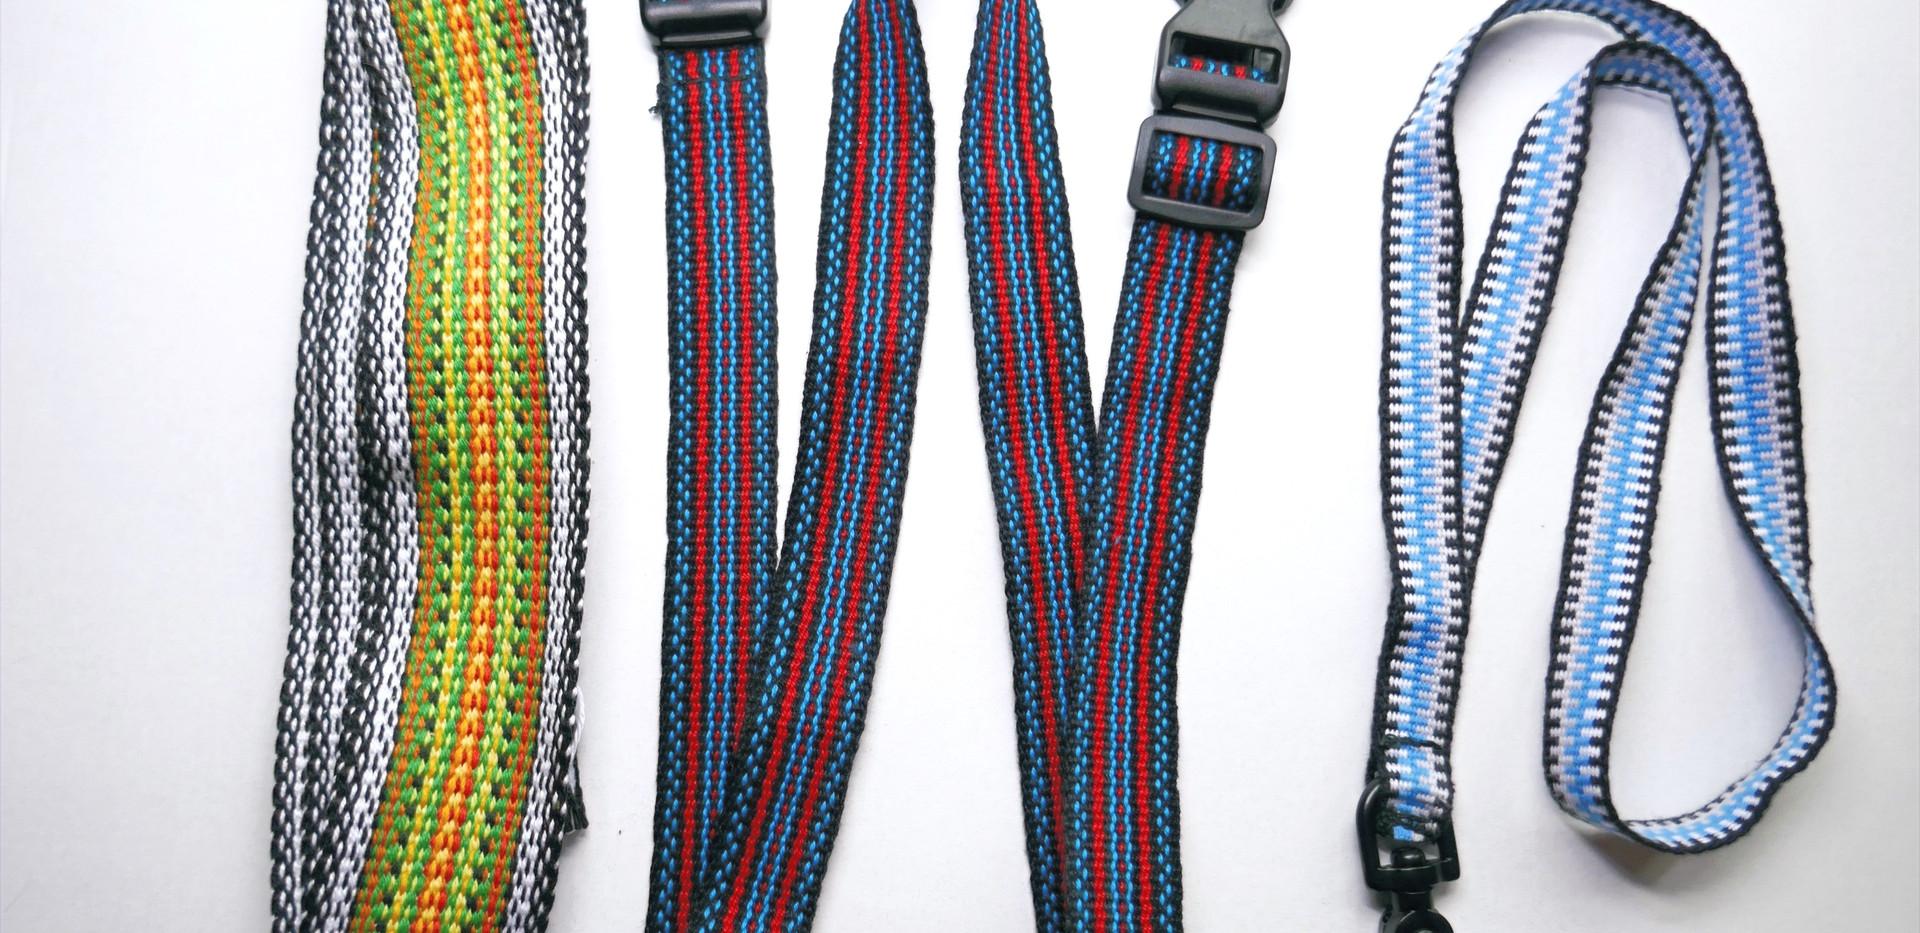 Plain Inkle weave